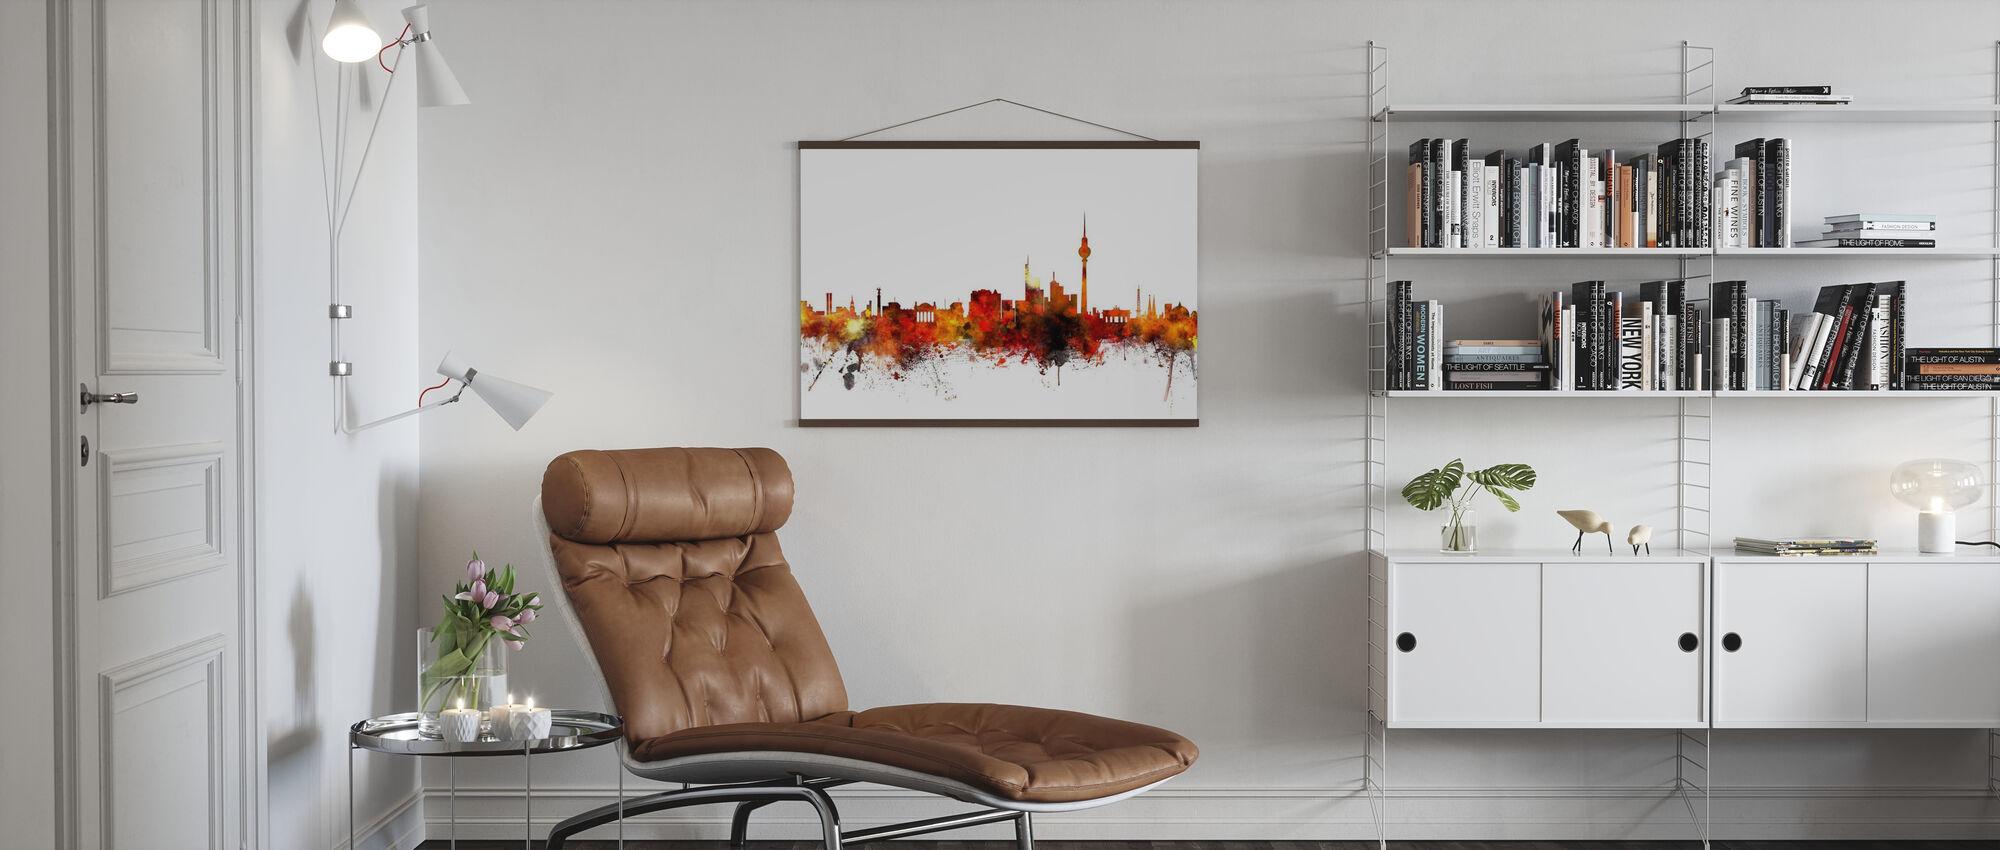 Berlin Skyline 2 - Poster - Living Room